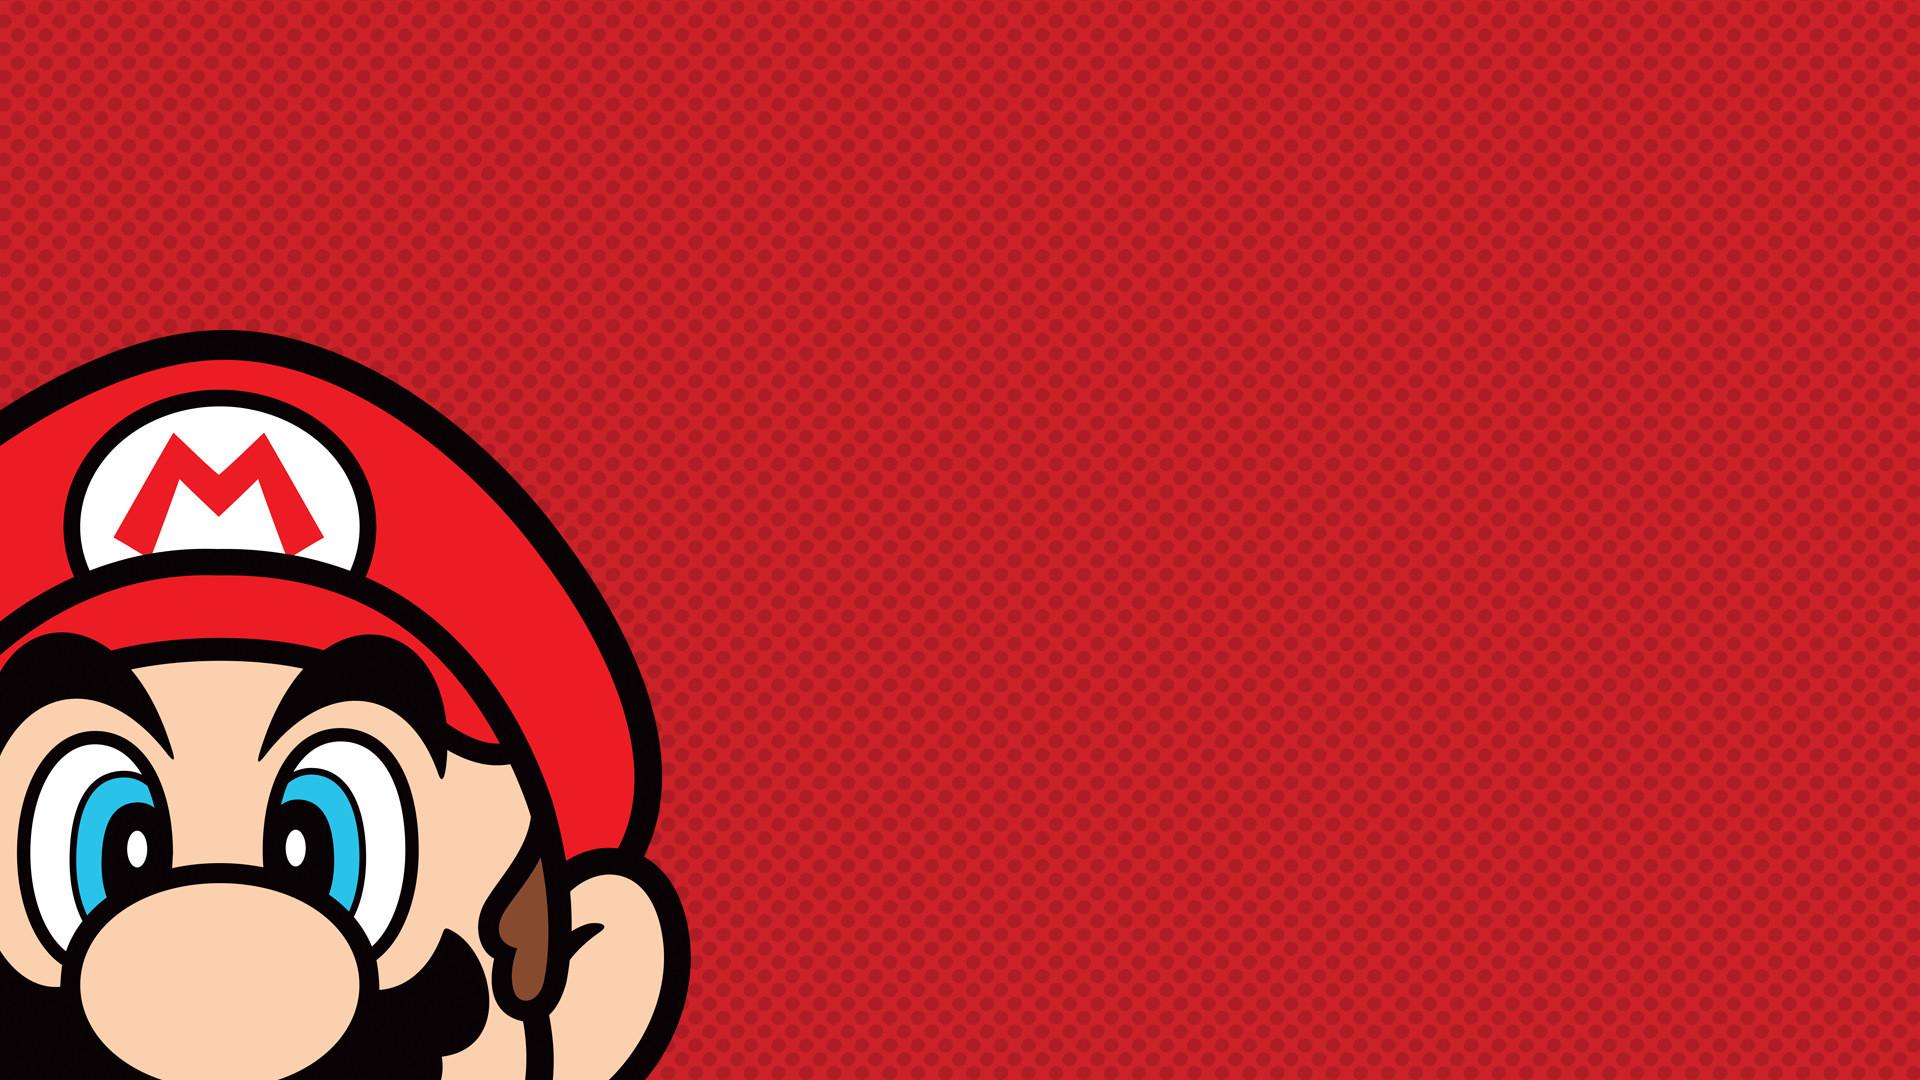 Res: 1920x1080, Nintendo  Wallpaper My Nintendo Wallpapers Albu On Snes Wallpaper  Images